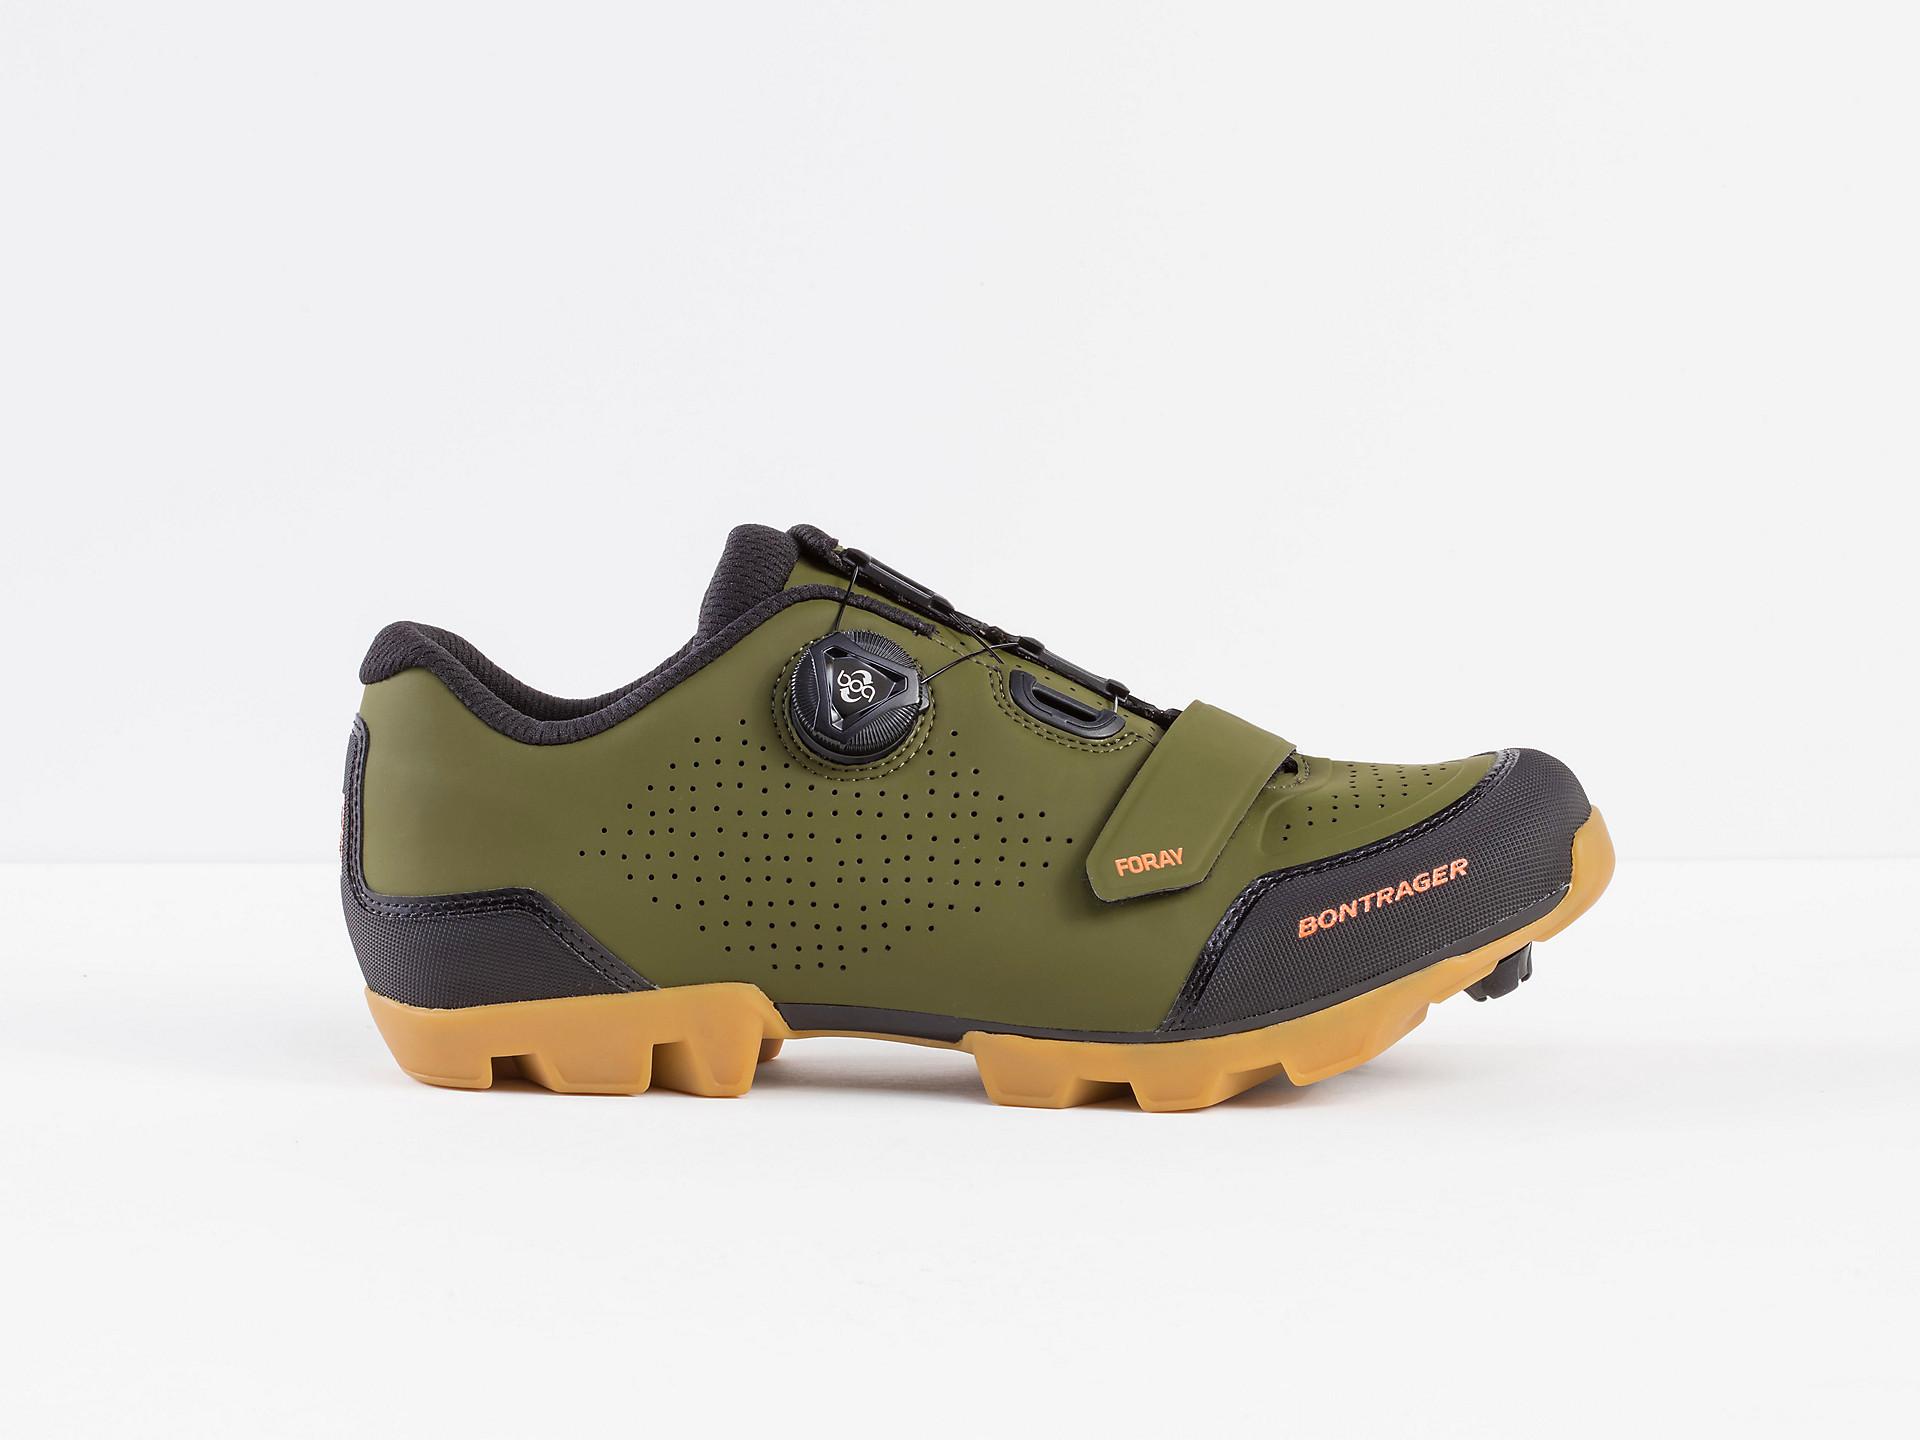 3b01923b92d2ce Bontrager Foray Mountain Shoe